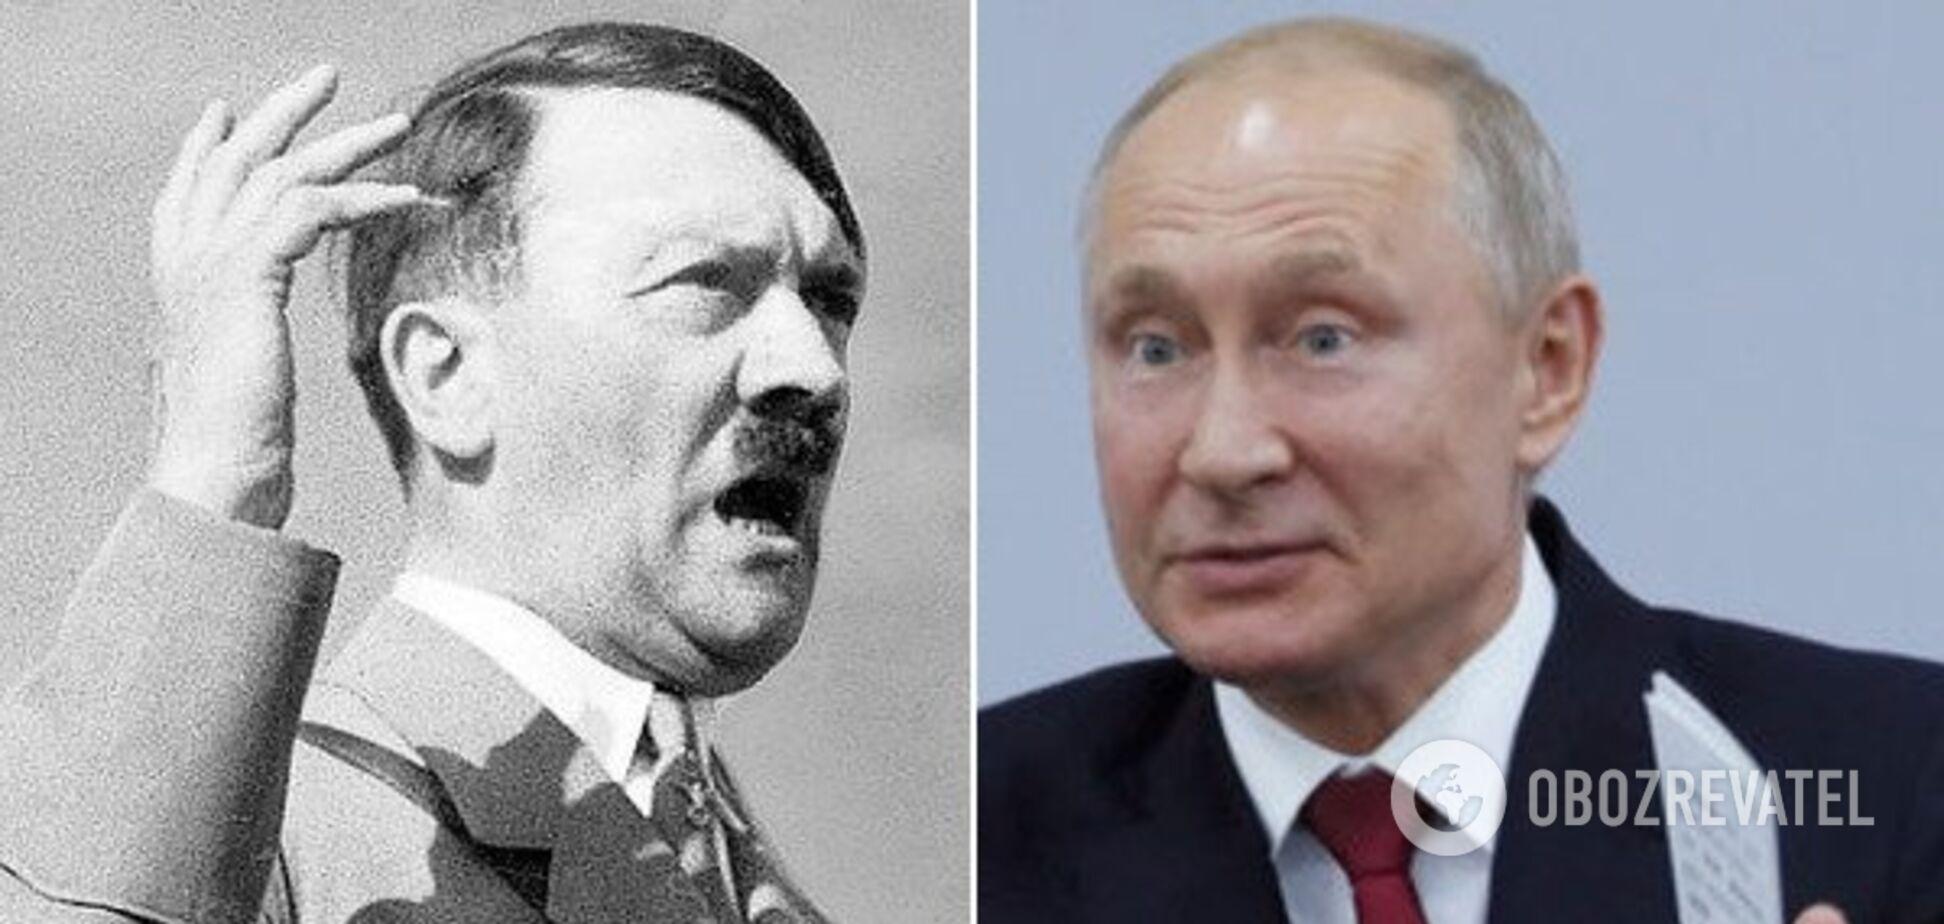 Адольф Гітлер і Володимир Путін